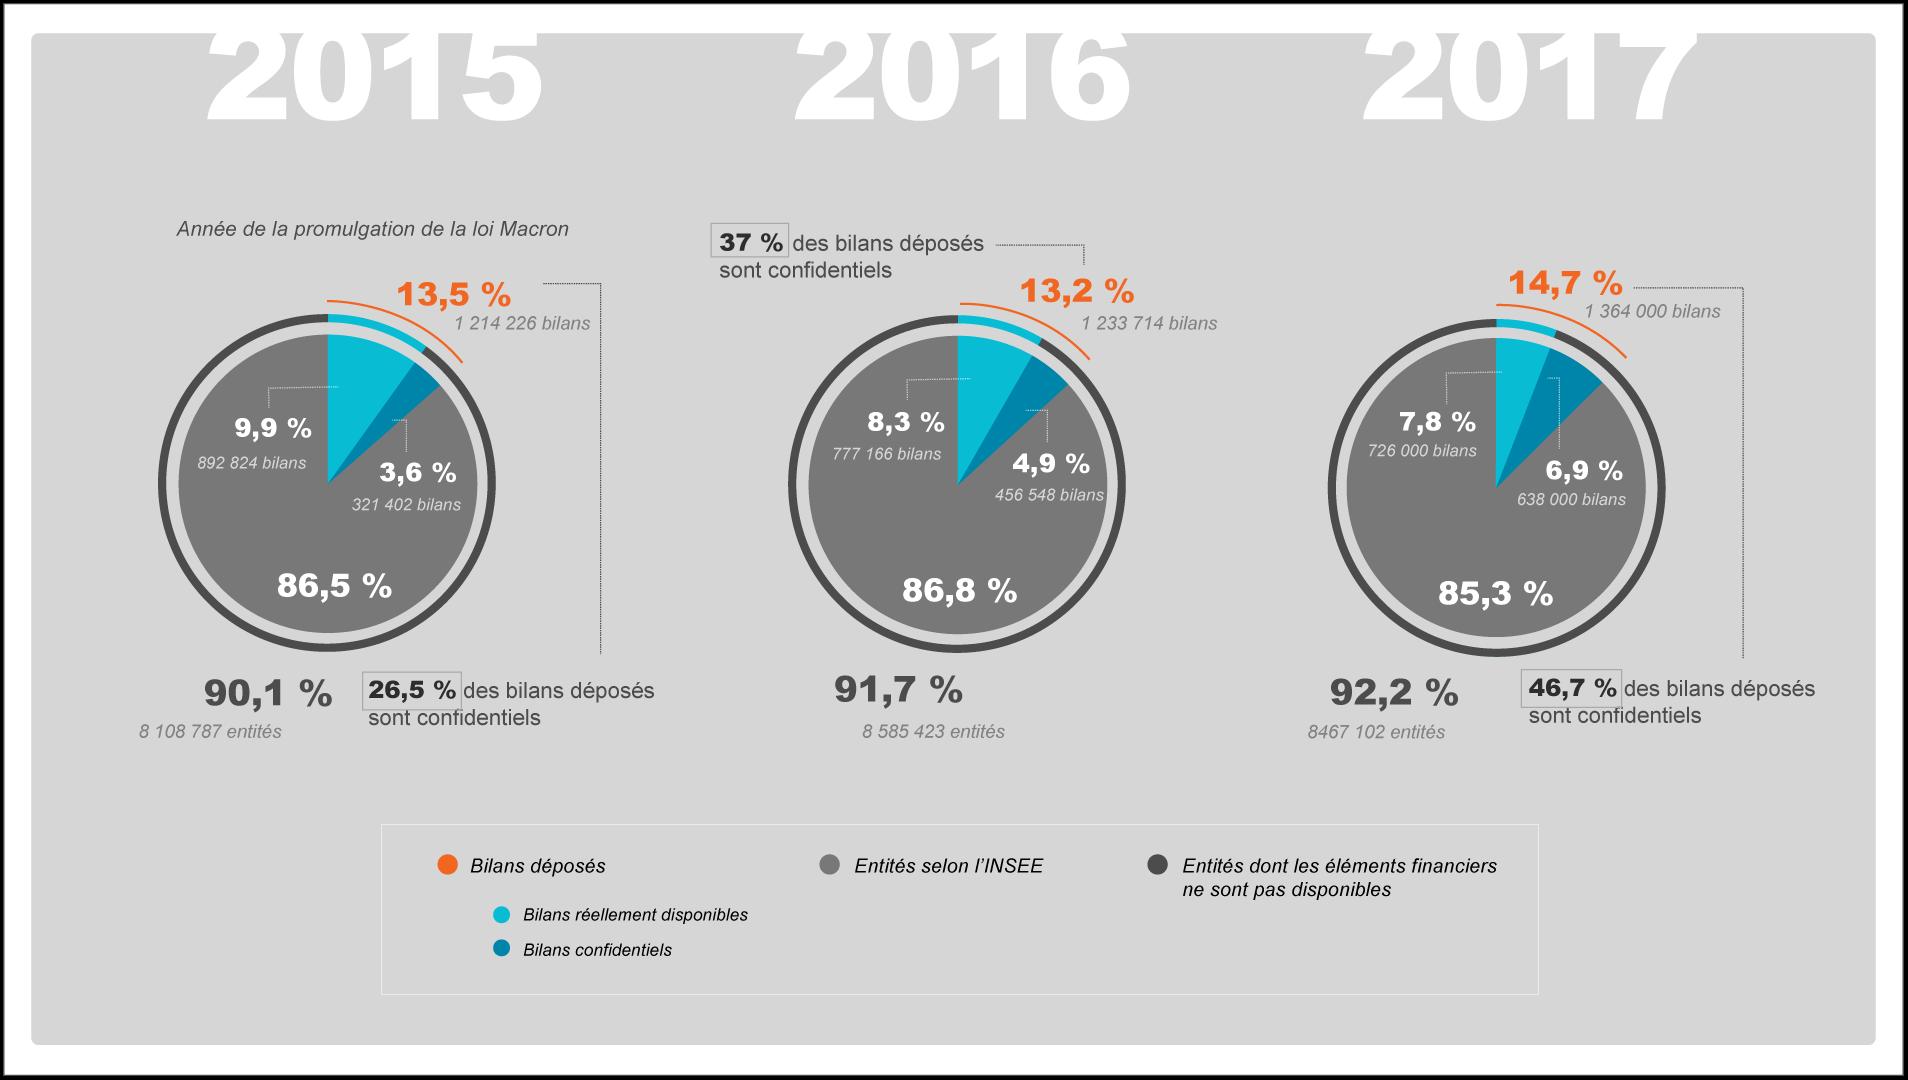 etude evolution bilans disponibles 2015-2017